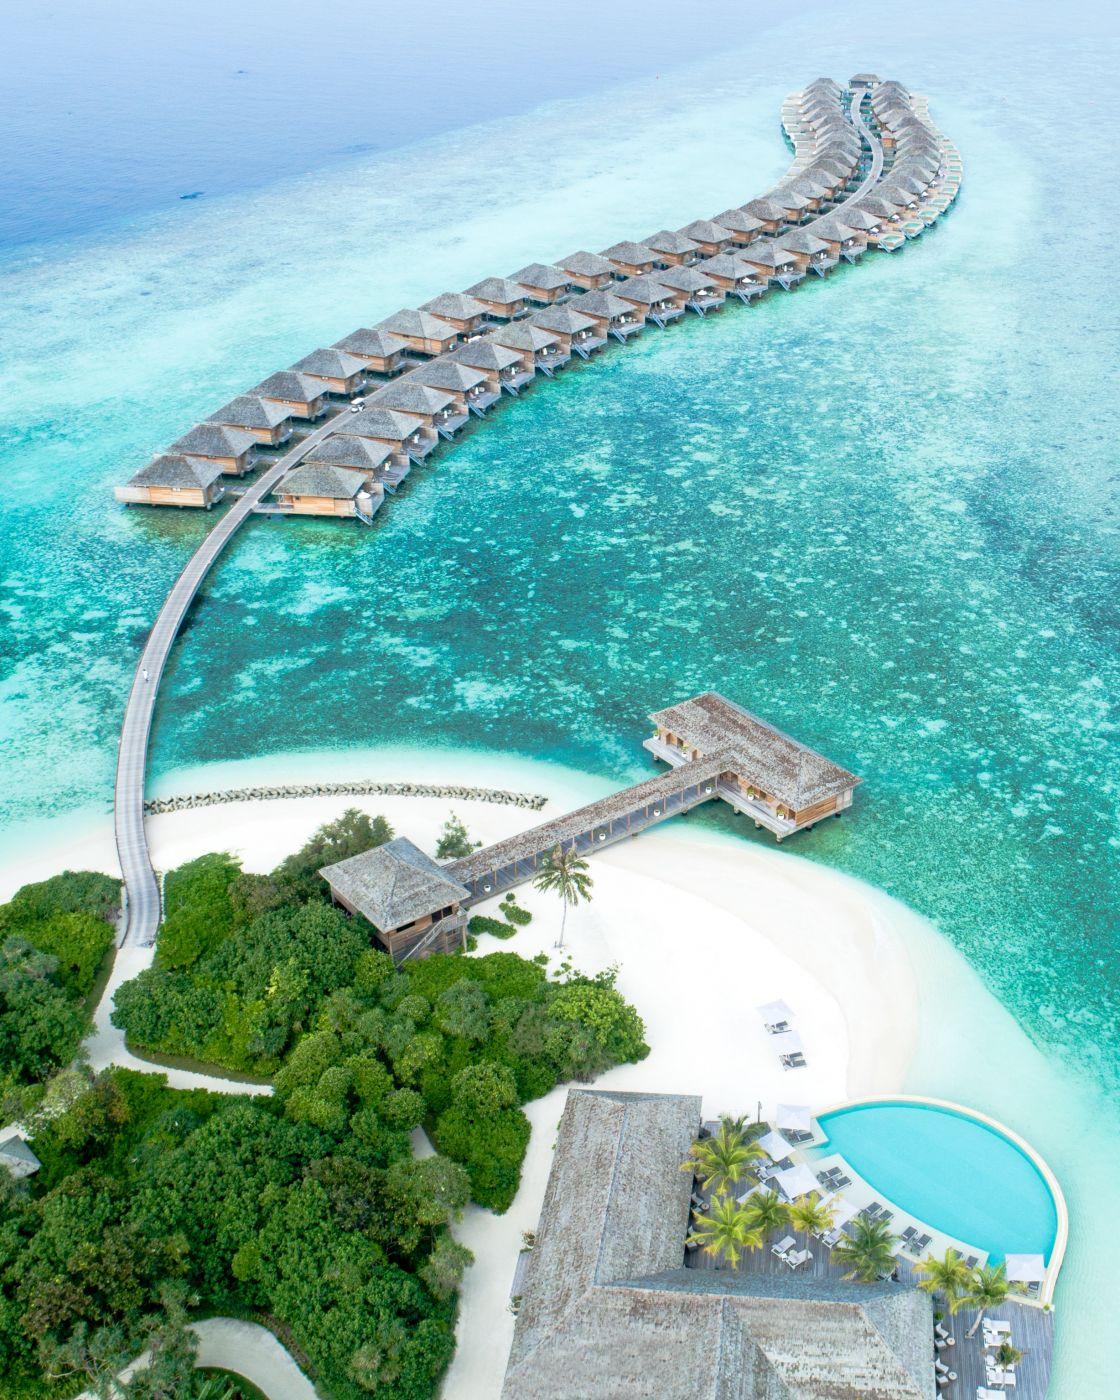 Hotel resort on a island nation